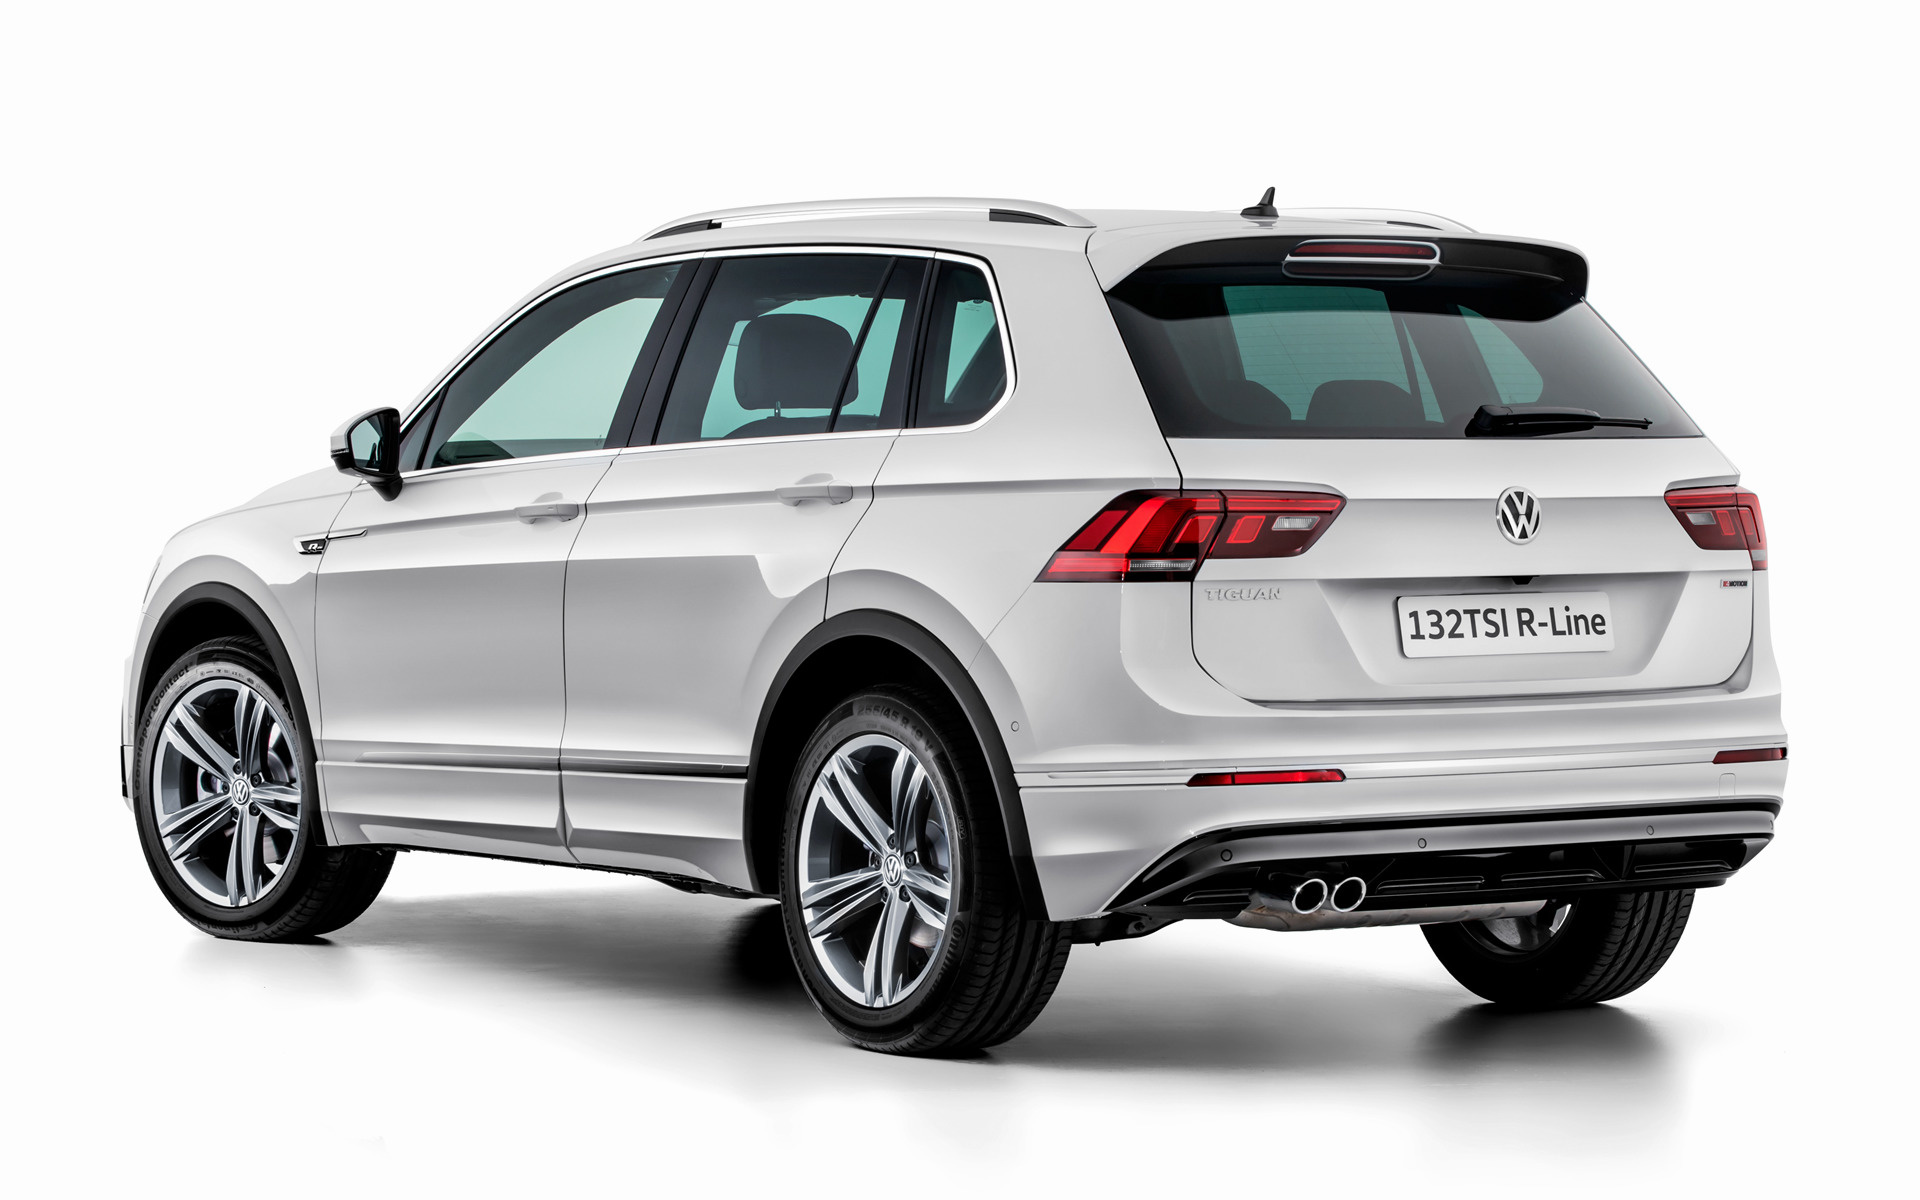 Sport Hyundai Dodge >> 2019 Volkswagen Tiguan R-Line Edition (AU) - Wallpapers ...